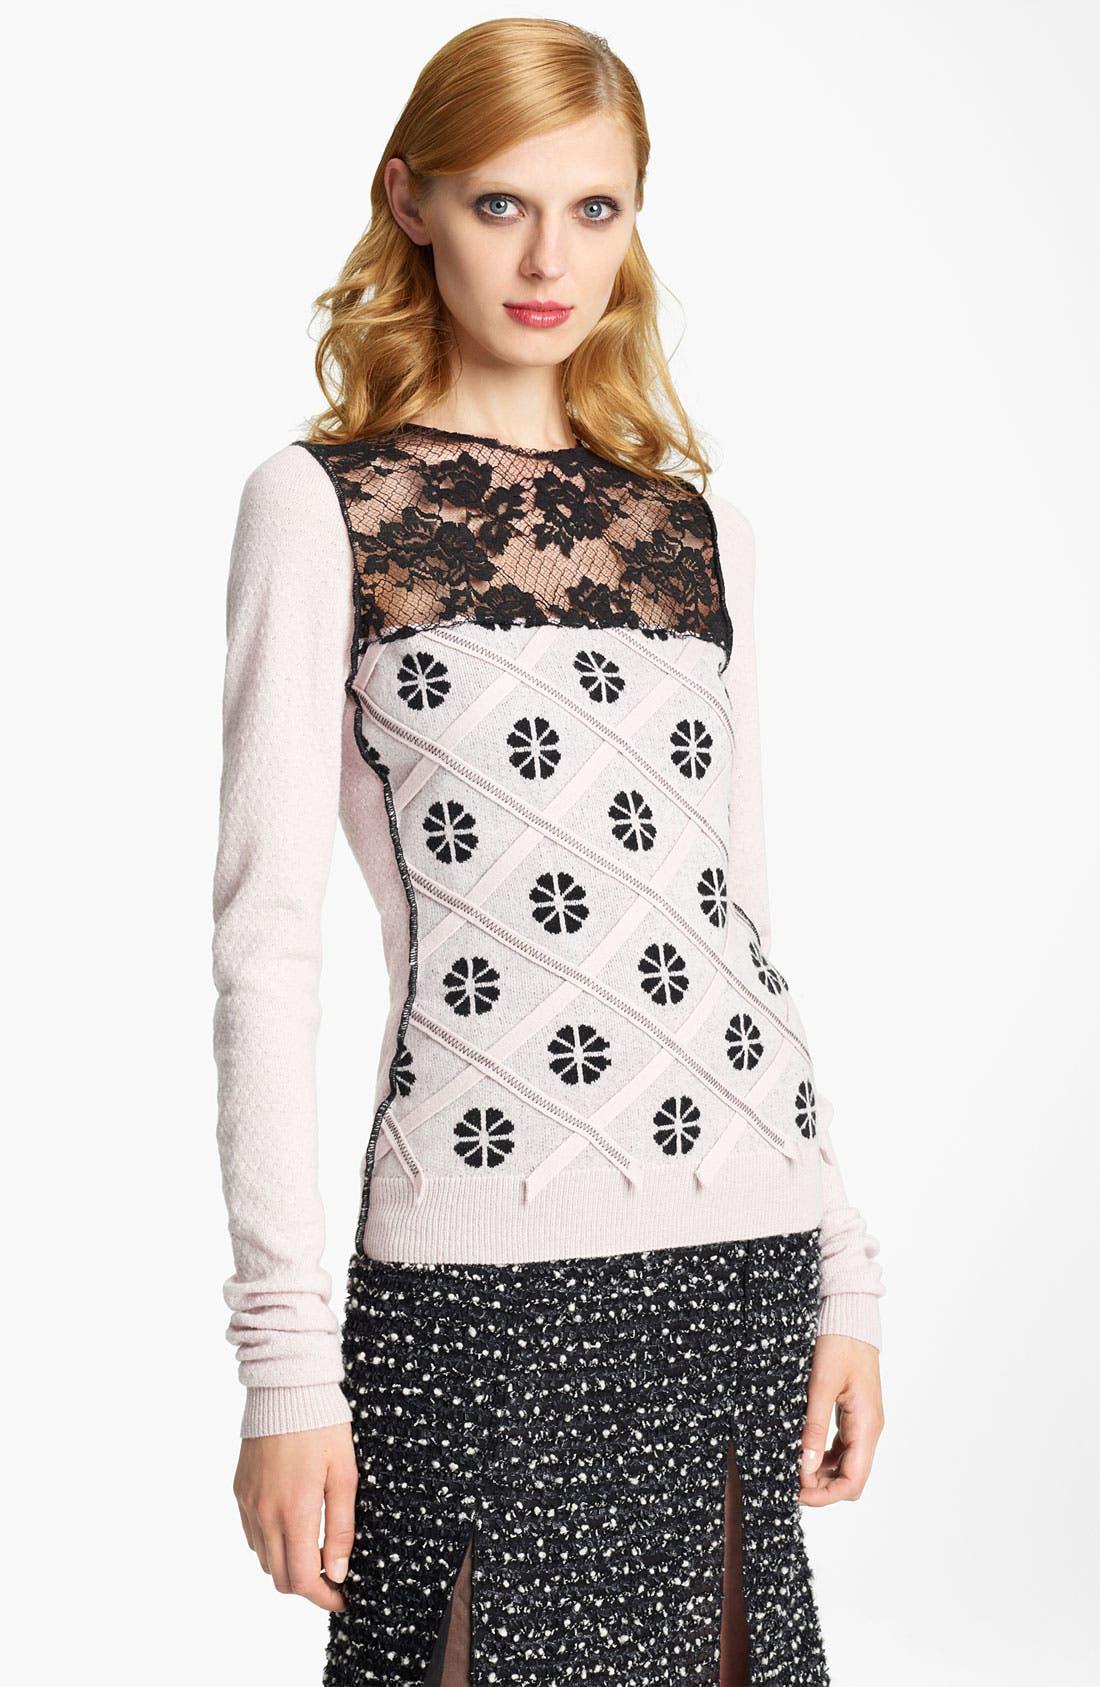 Alternate Image 1 Selected - Nina Ricci Lace Inset Knit Top